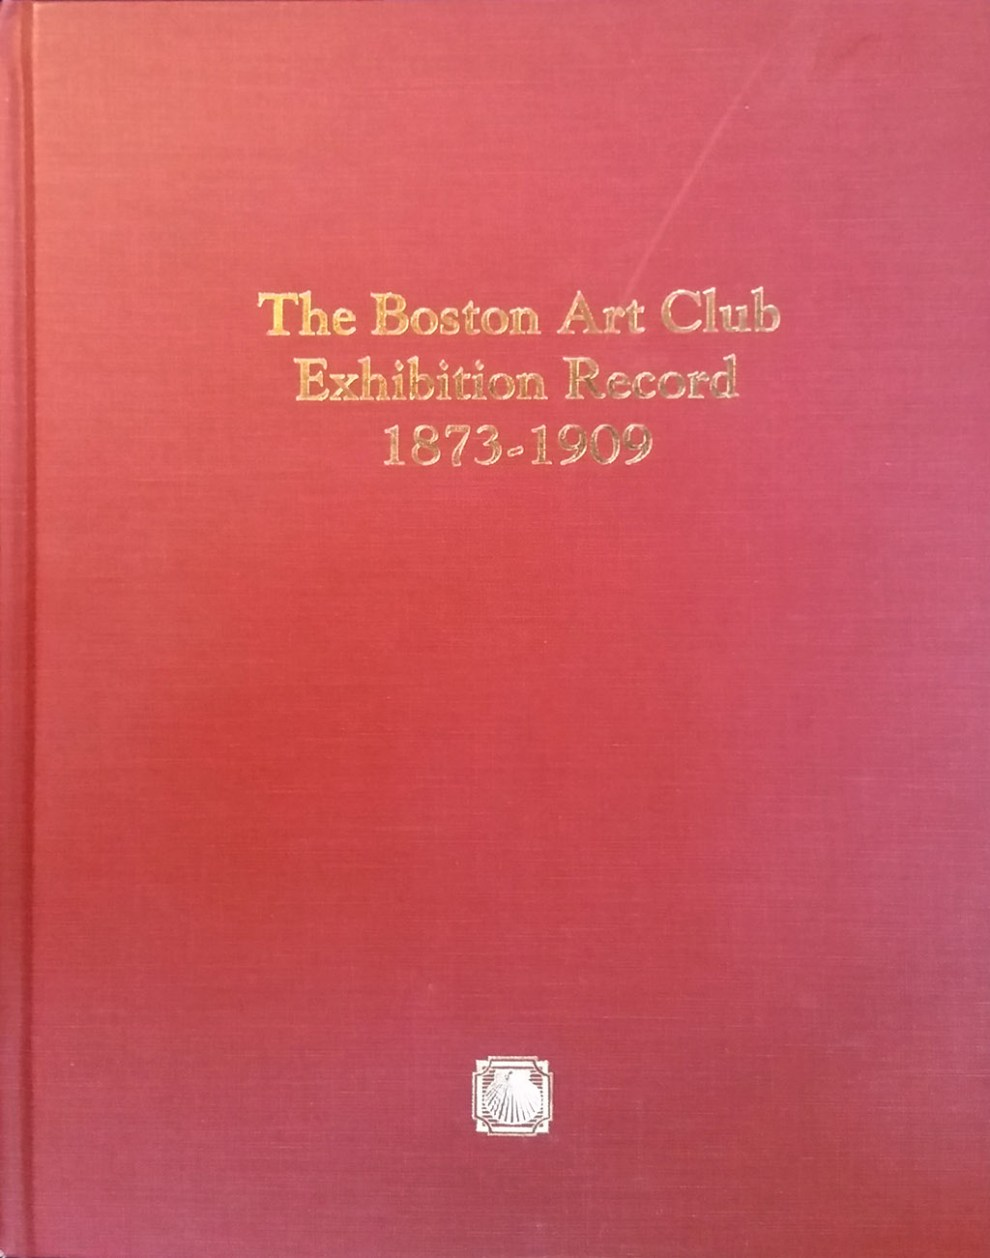 Boston Art Club Exhibition Records